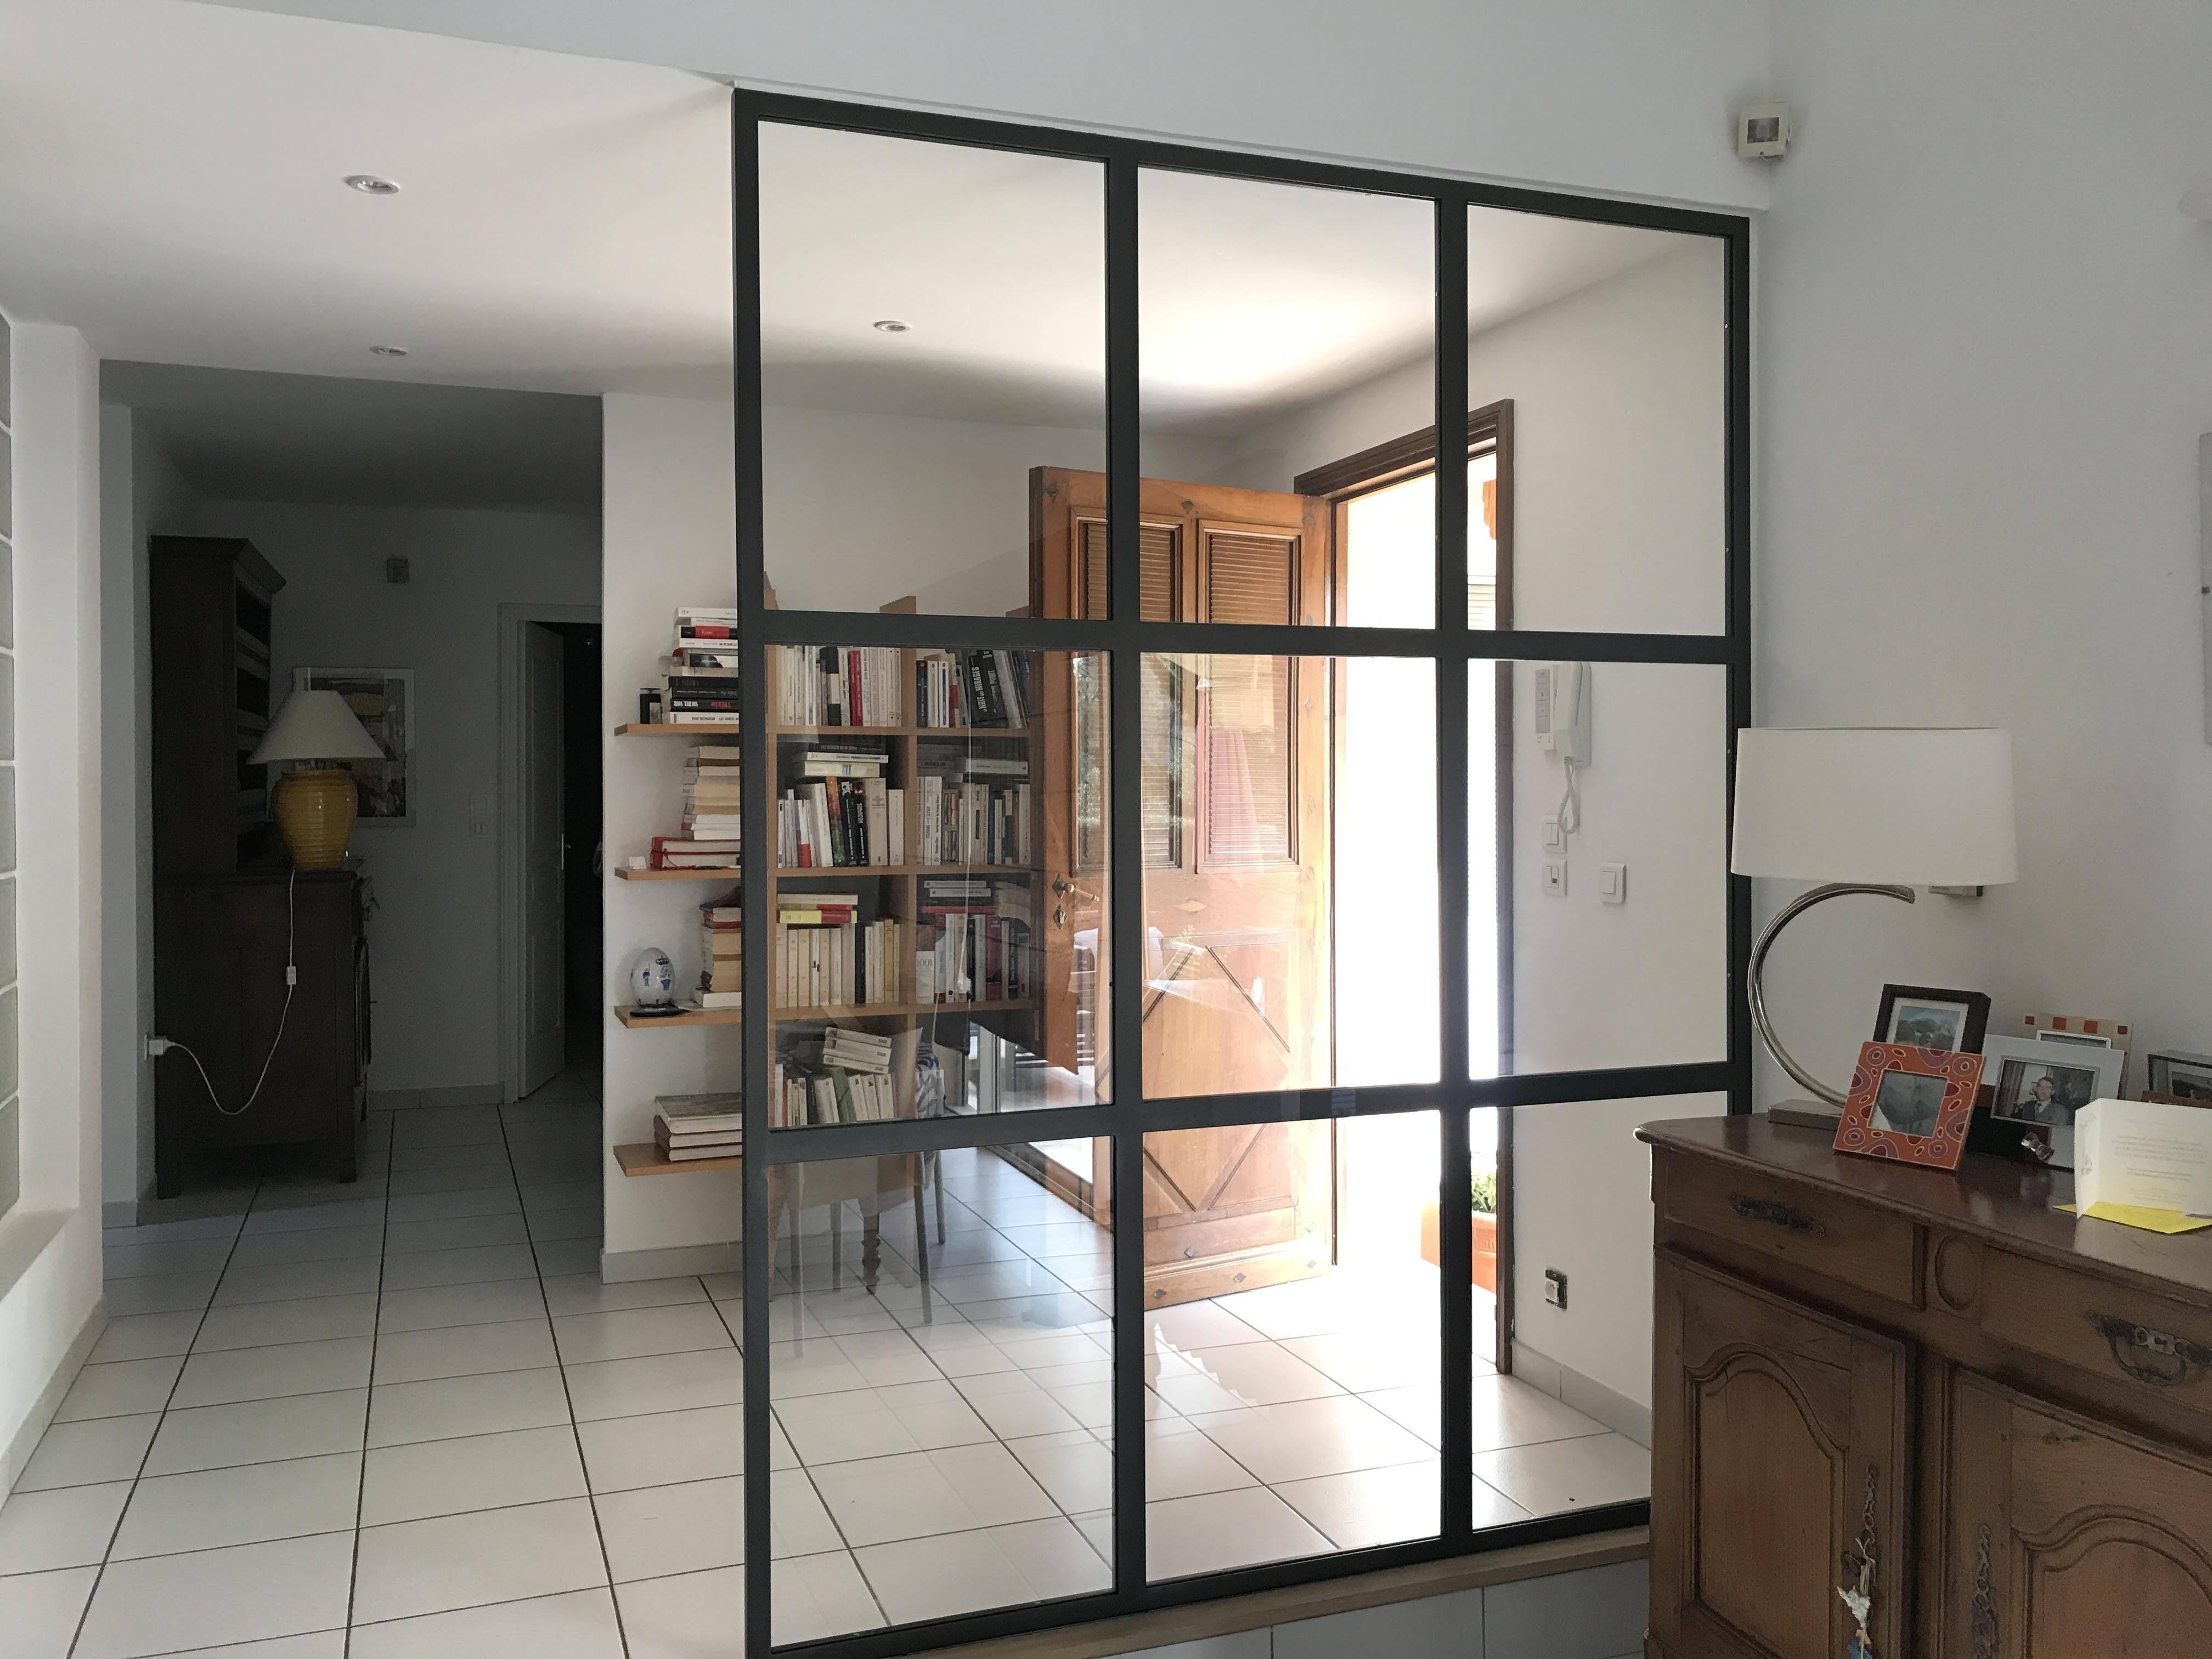 verriere atelier dartiste verriere exterieure atelier. Black Bedroom Furniture Sets. Home Design Ideas